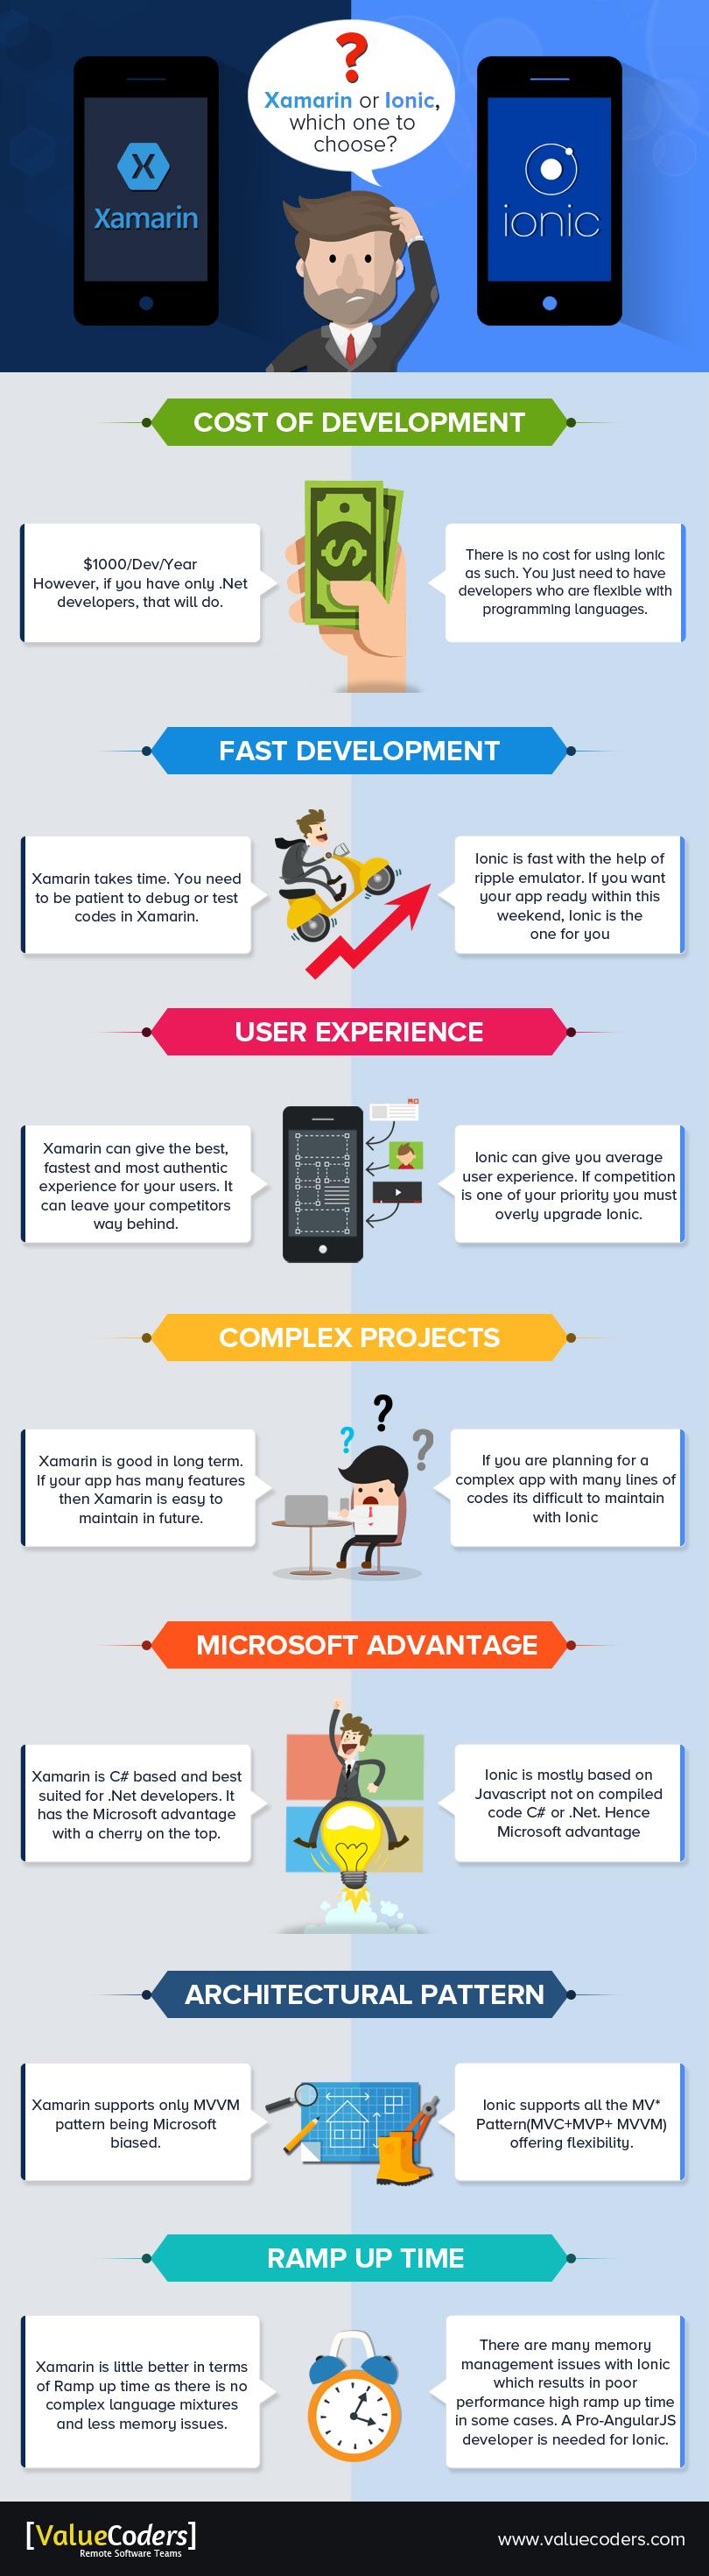 Xamarin-vs-Ionic_infographic